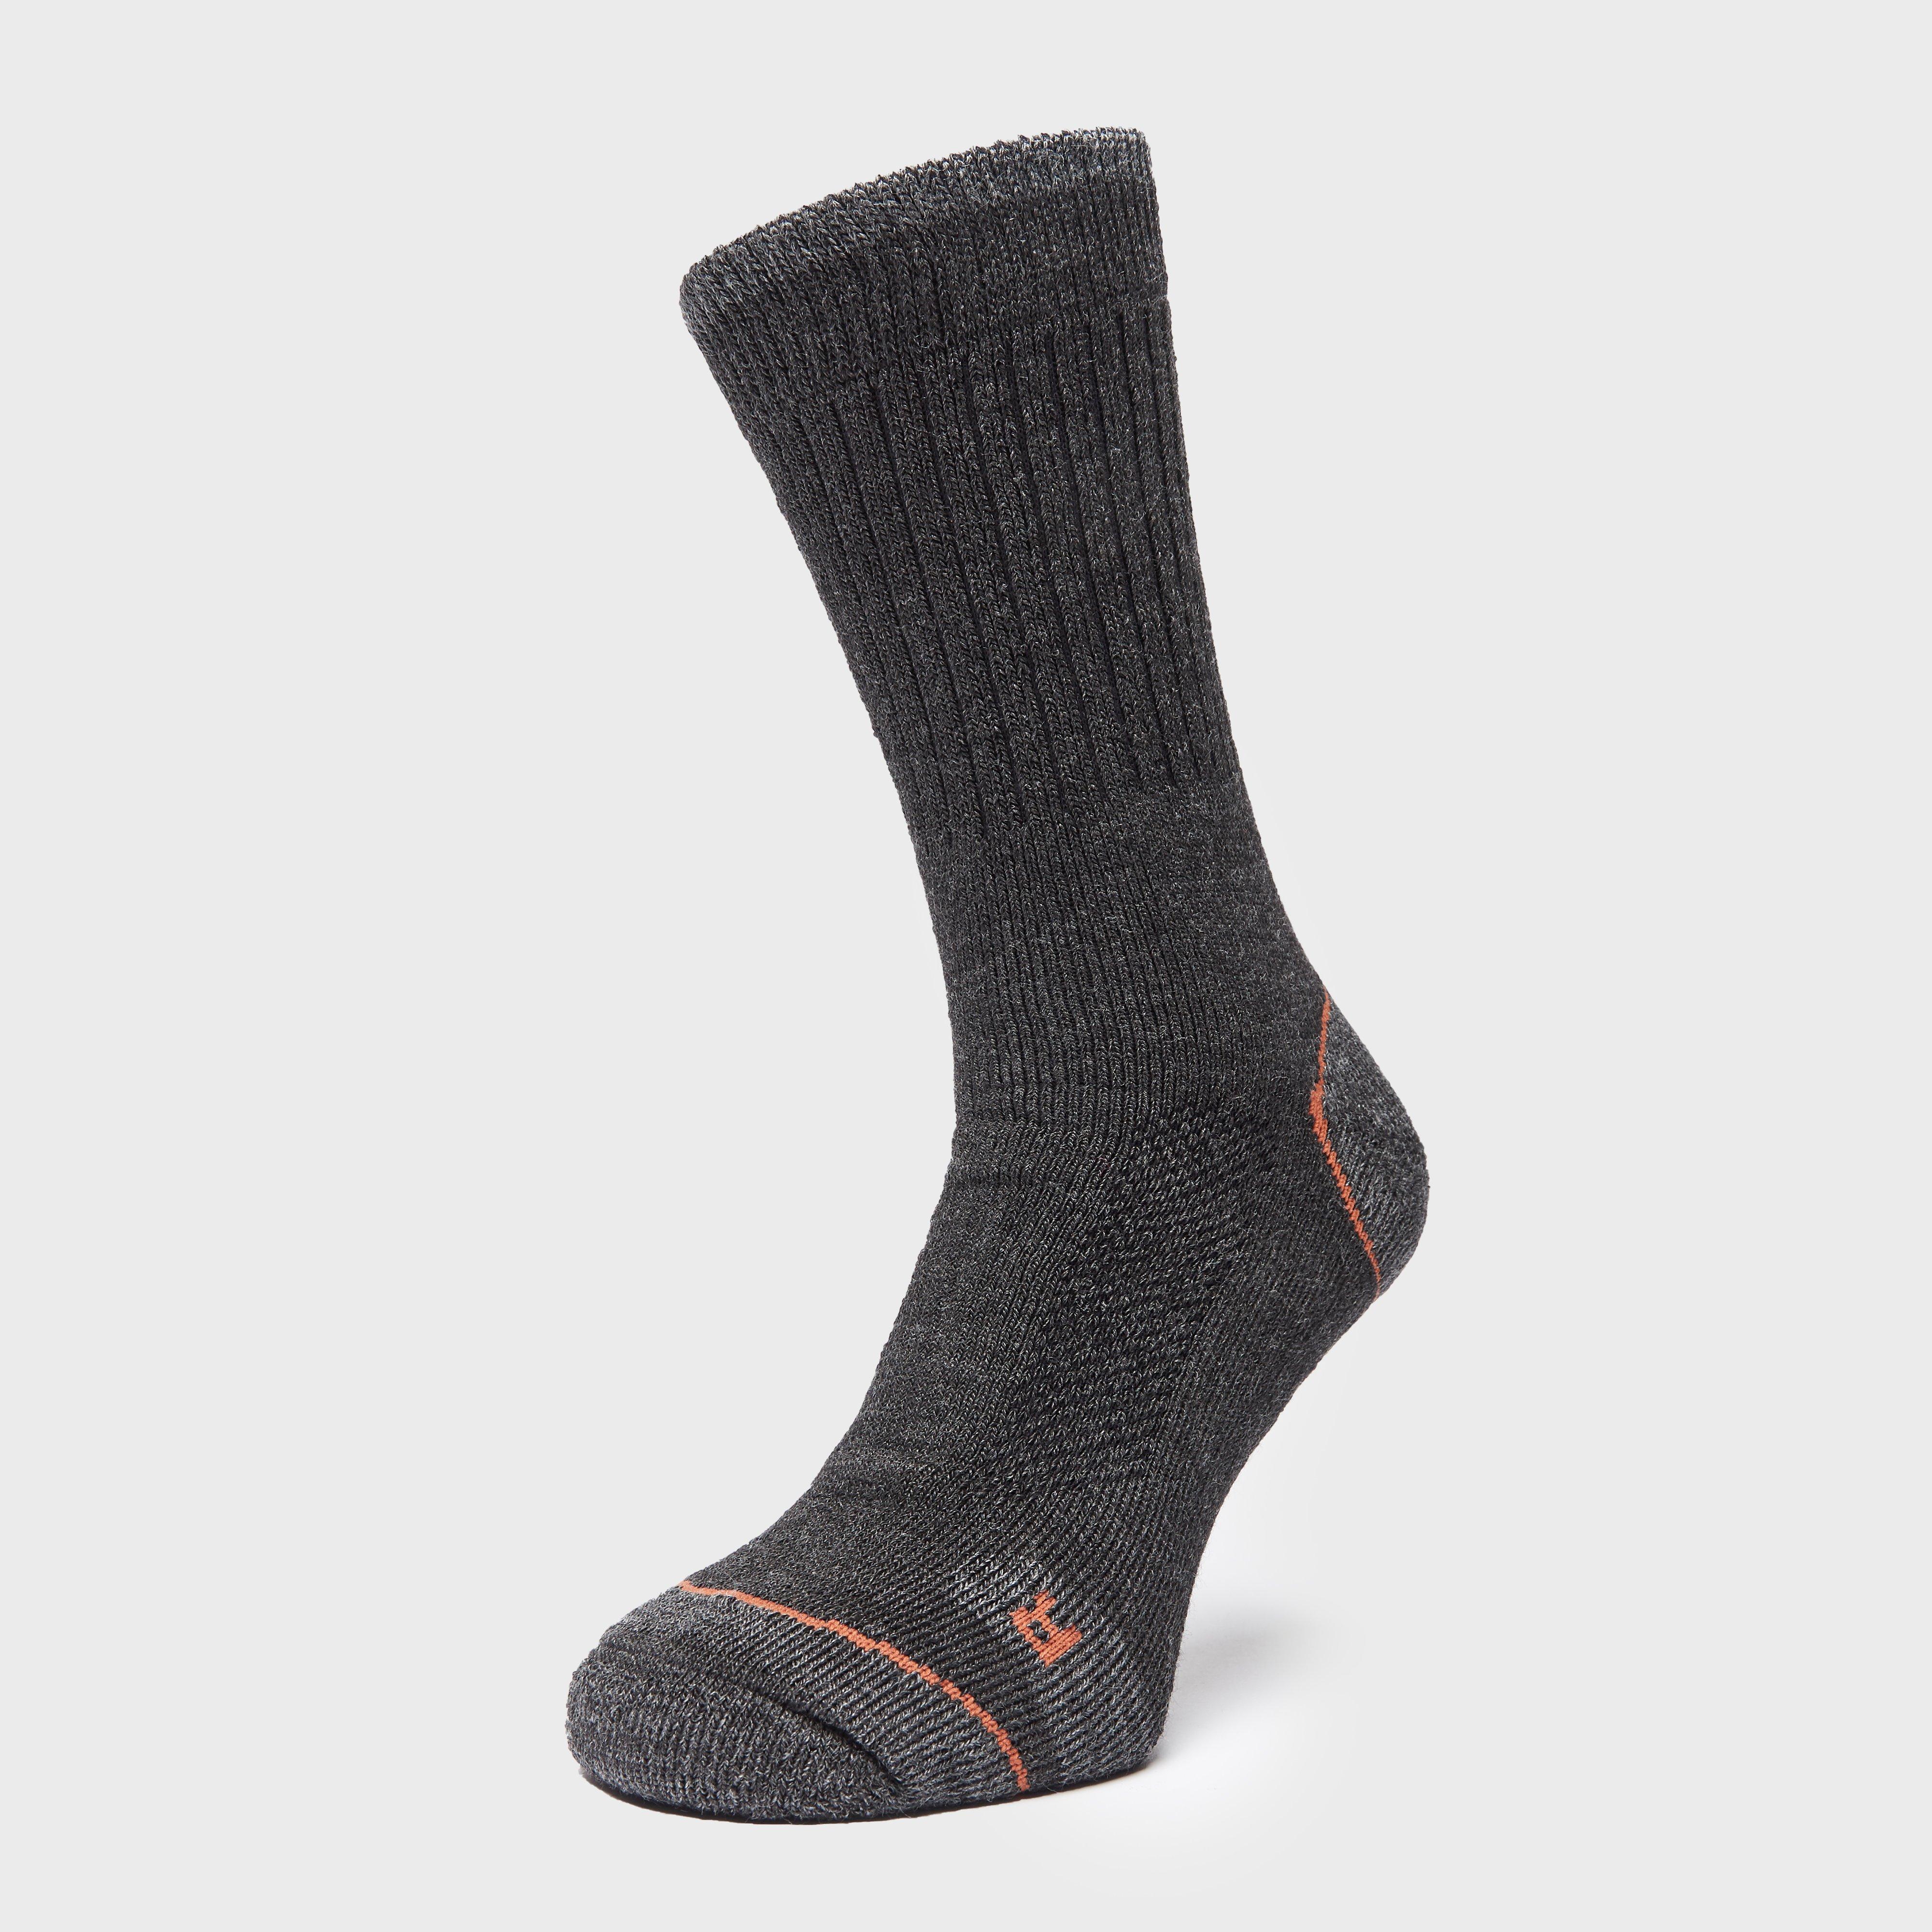 Brasher Mens Walker Socks - Grey/gry  Grey/gry